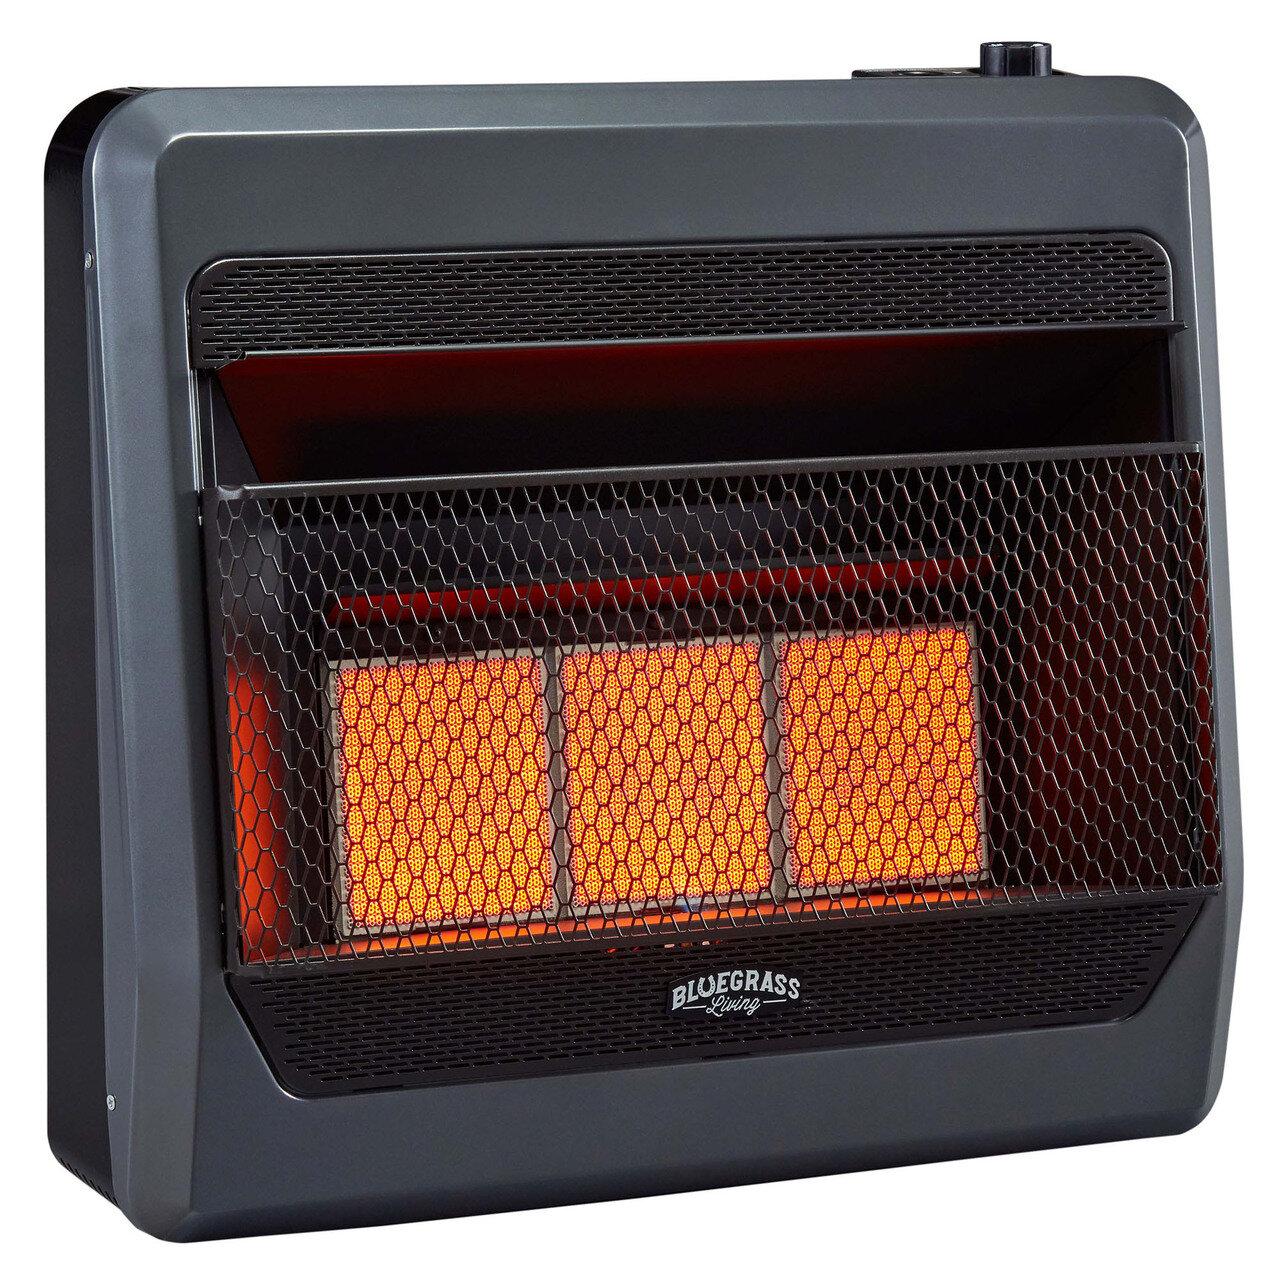 Bluegrass Living Natural Gas Infrared Heater With Blower And Base Feet Wayfair